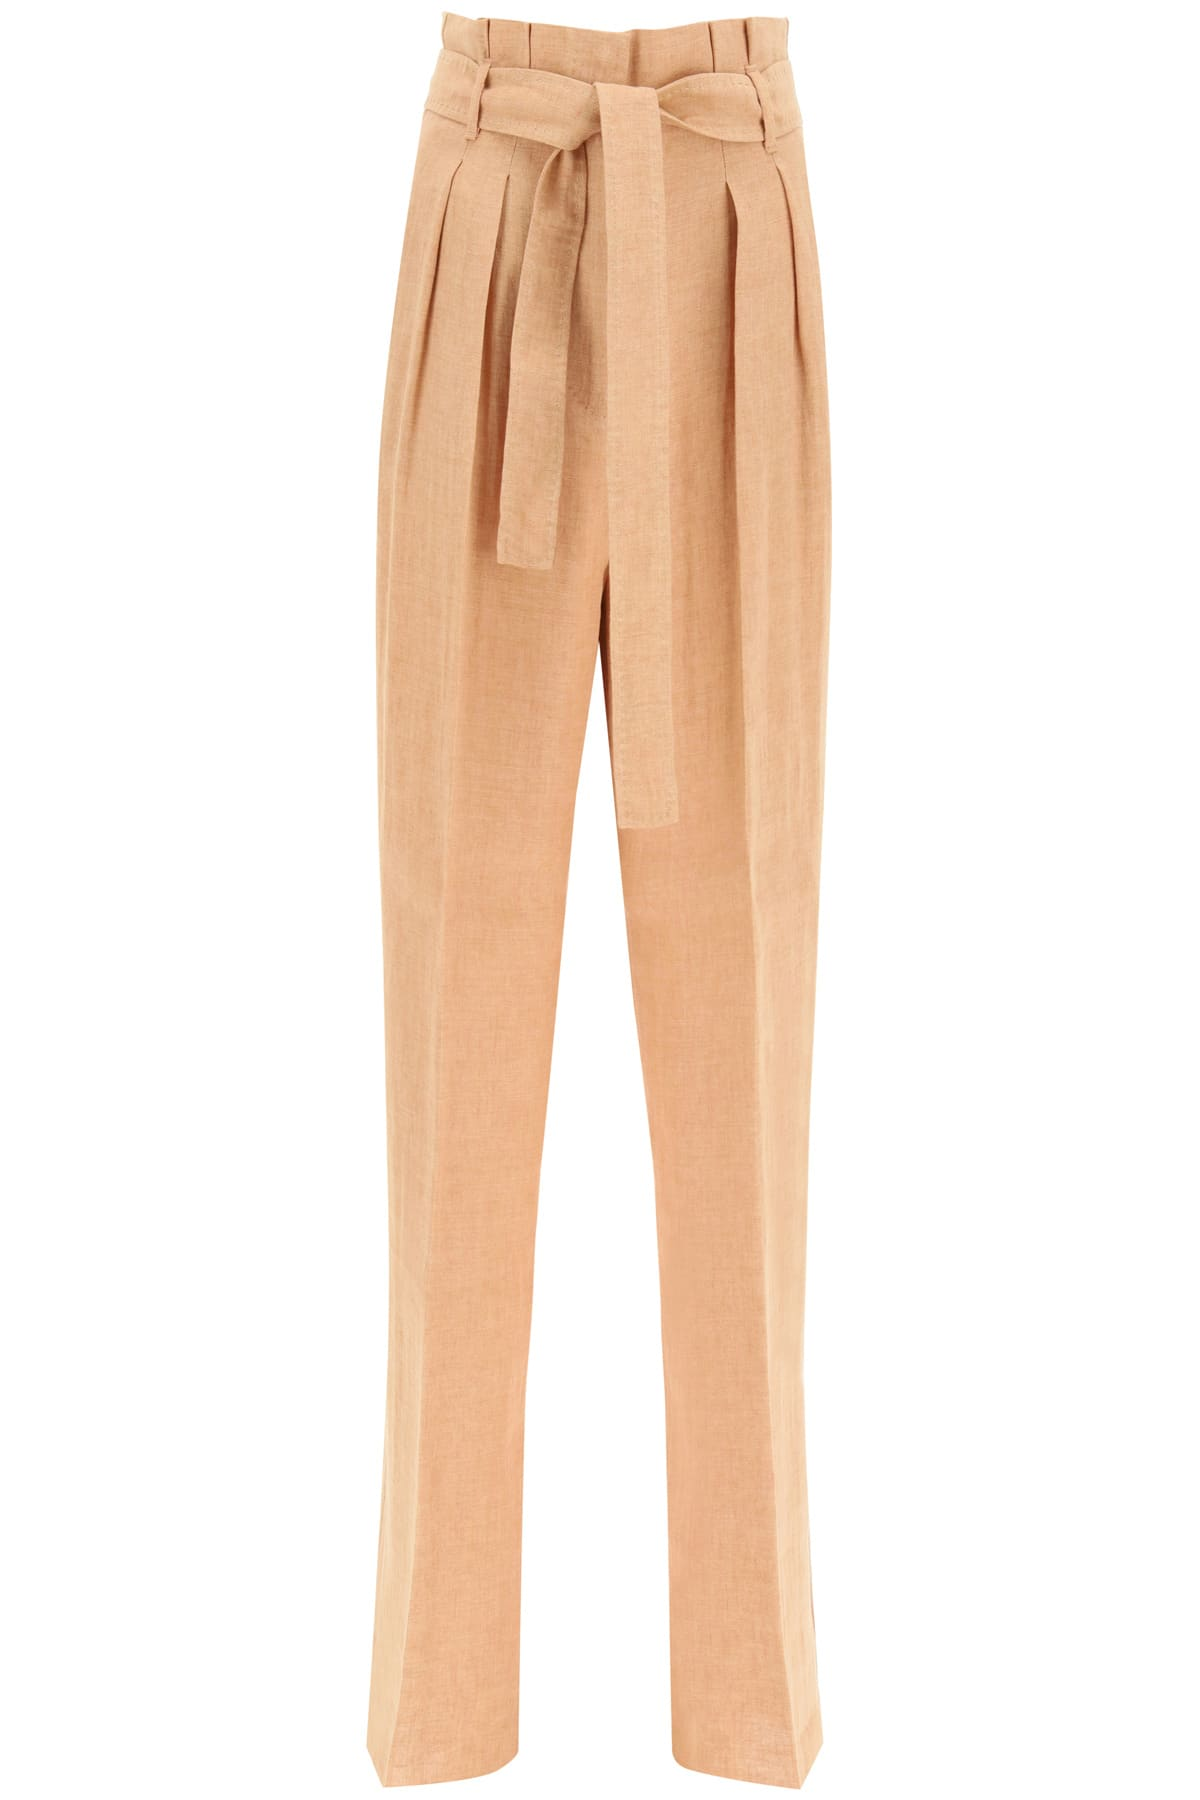 Cera Trousers In Linen Batavia